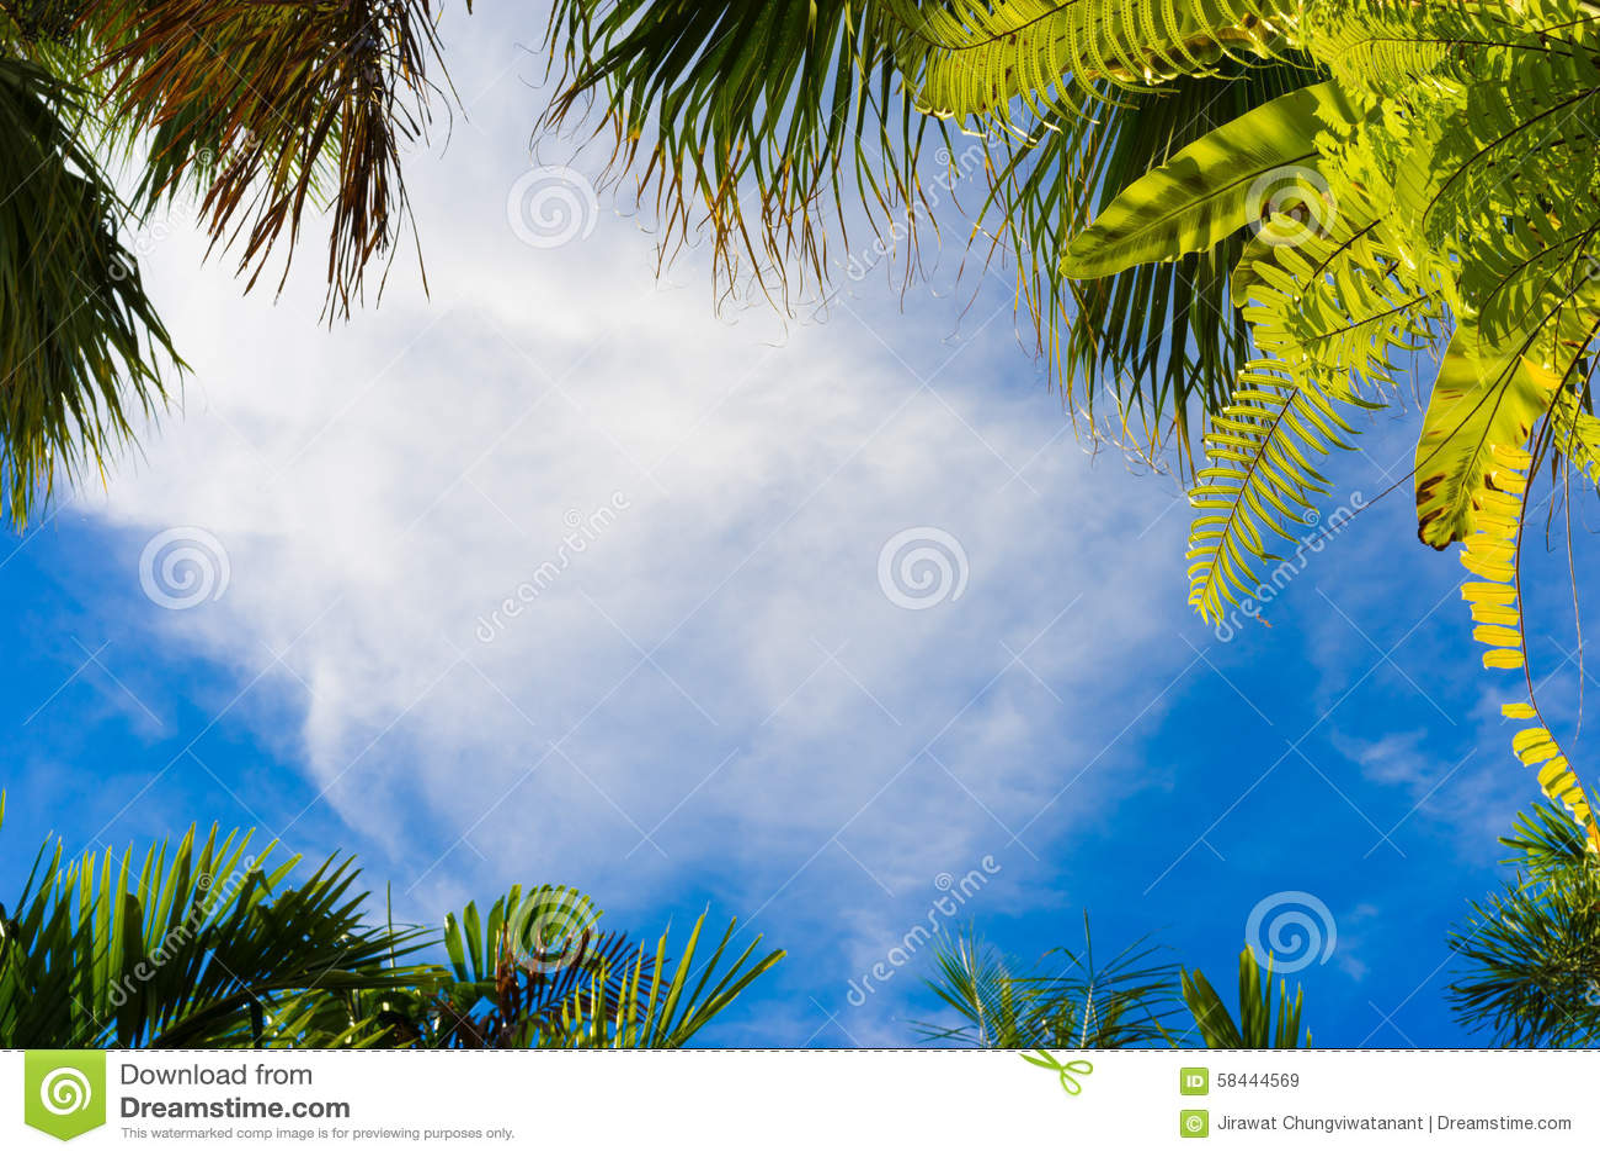 Coconut tree frame